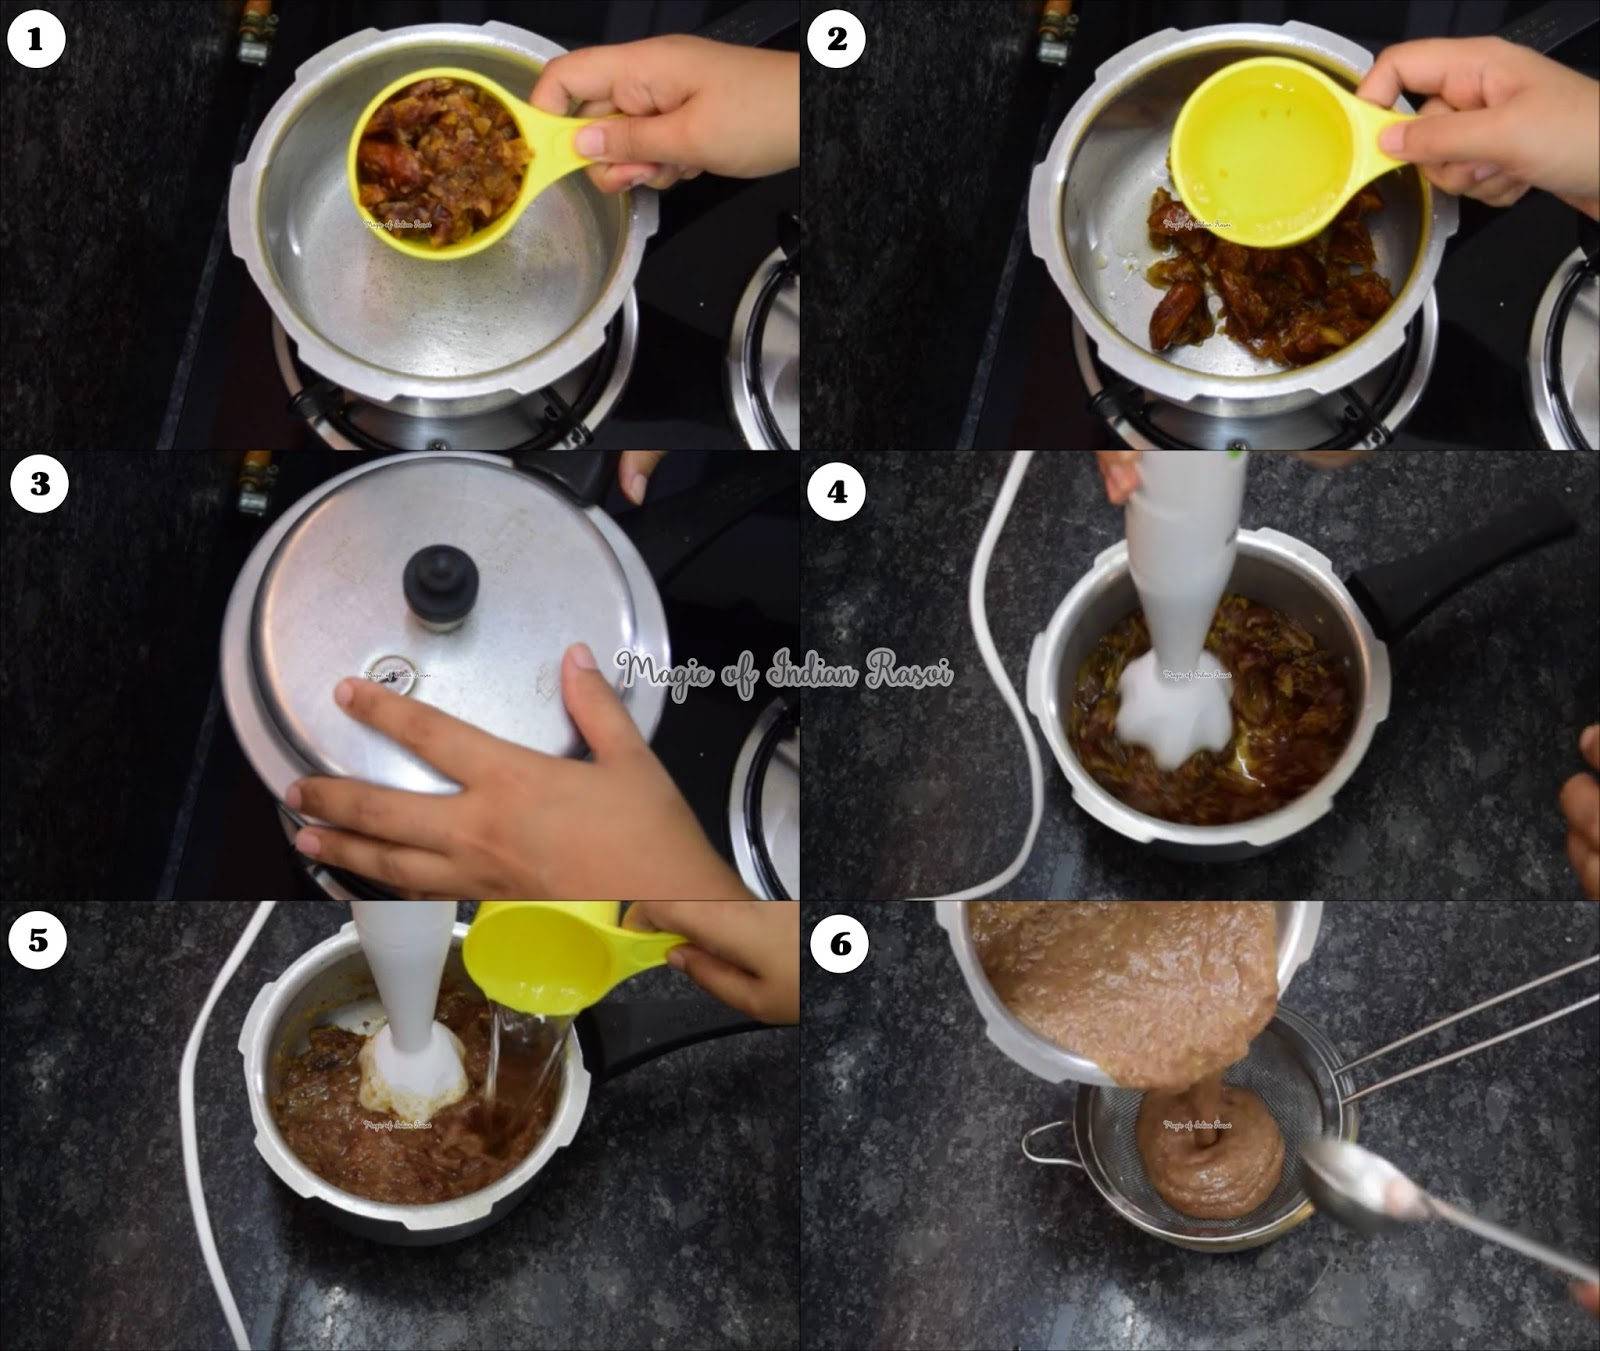 Make Dates Tamarind Chutney at Home - खजूर इमली की चटनी घर पे बनाये - Priya R - Magic of Indian Rasoi